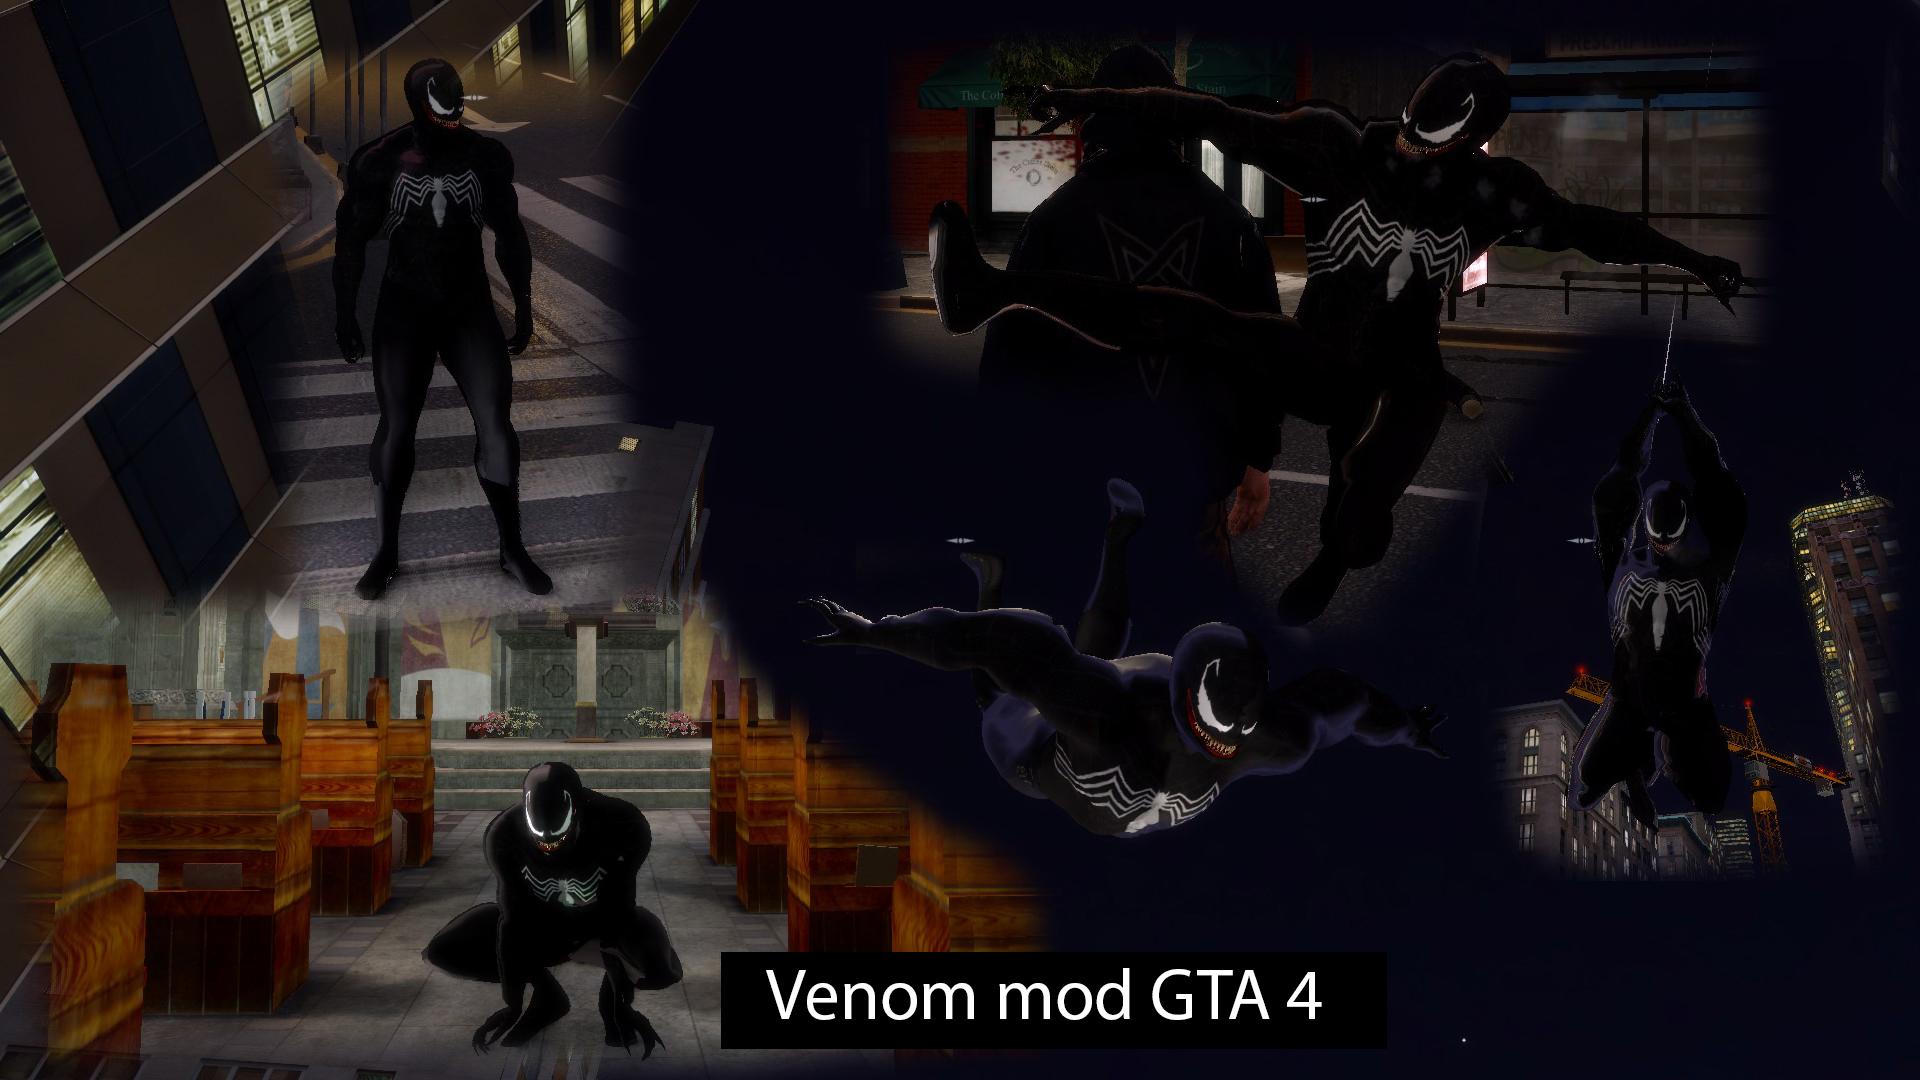 Venom from Spider-man 3 for GTA 4 addon - Mod DB